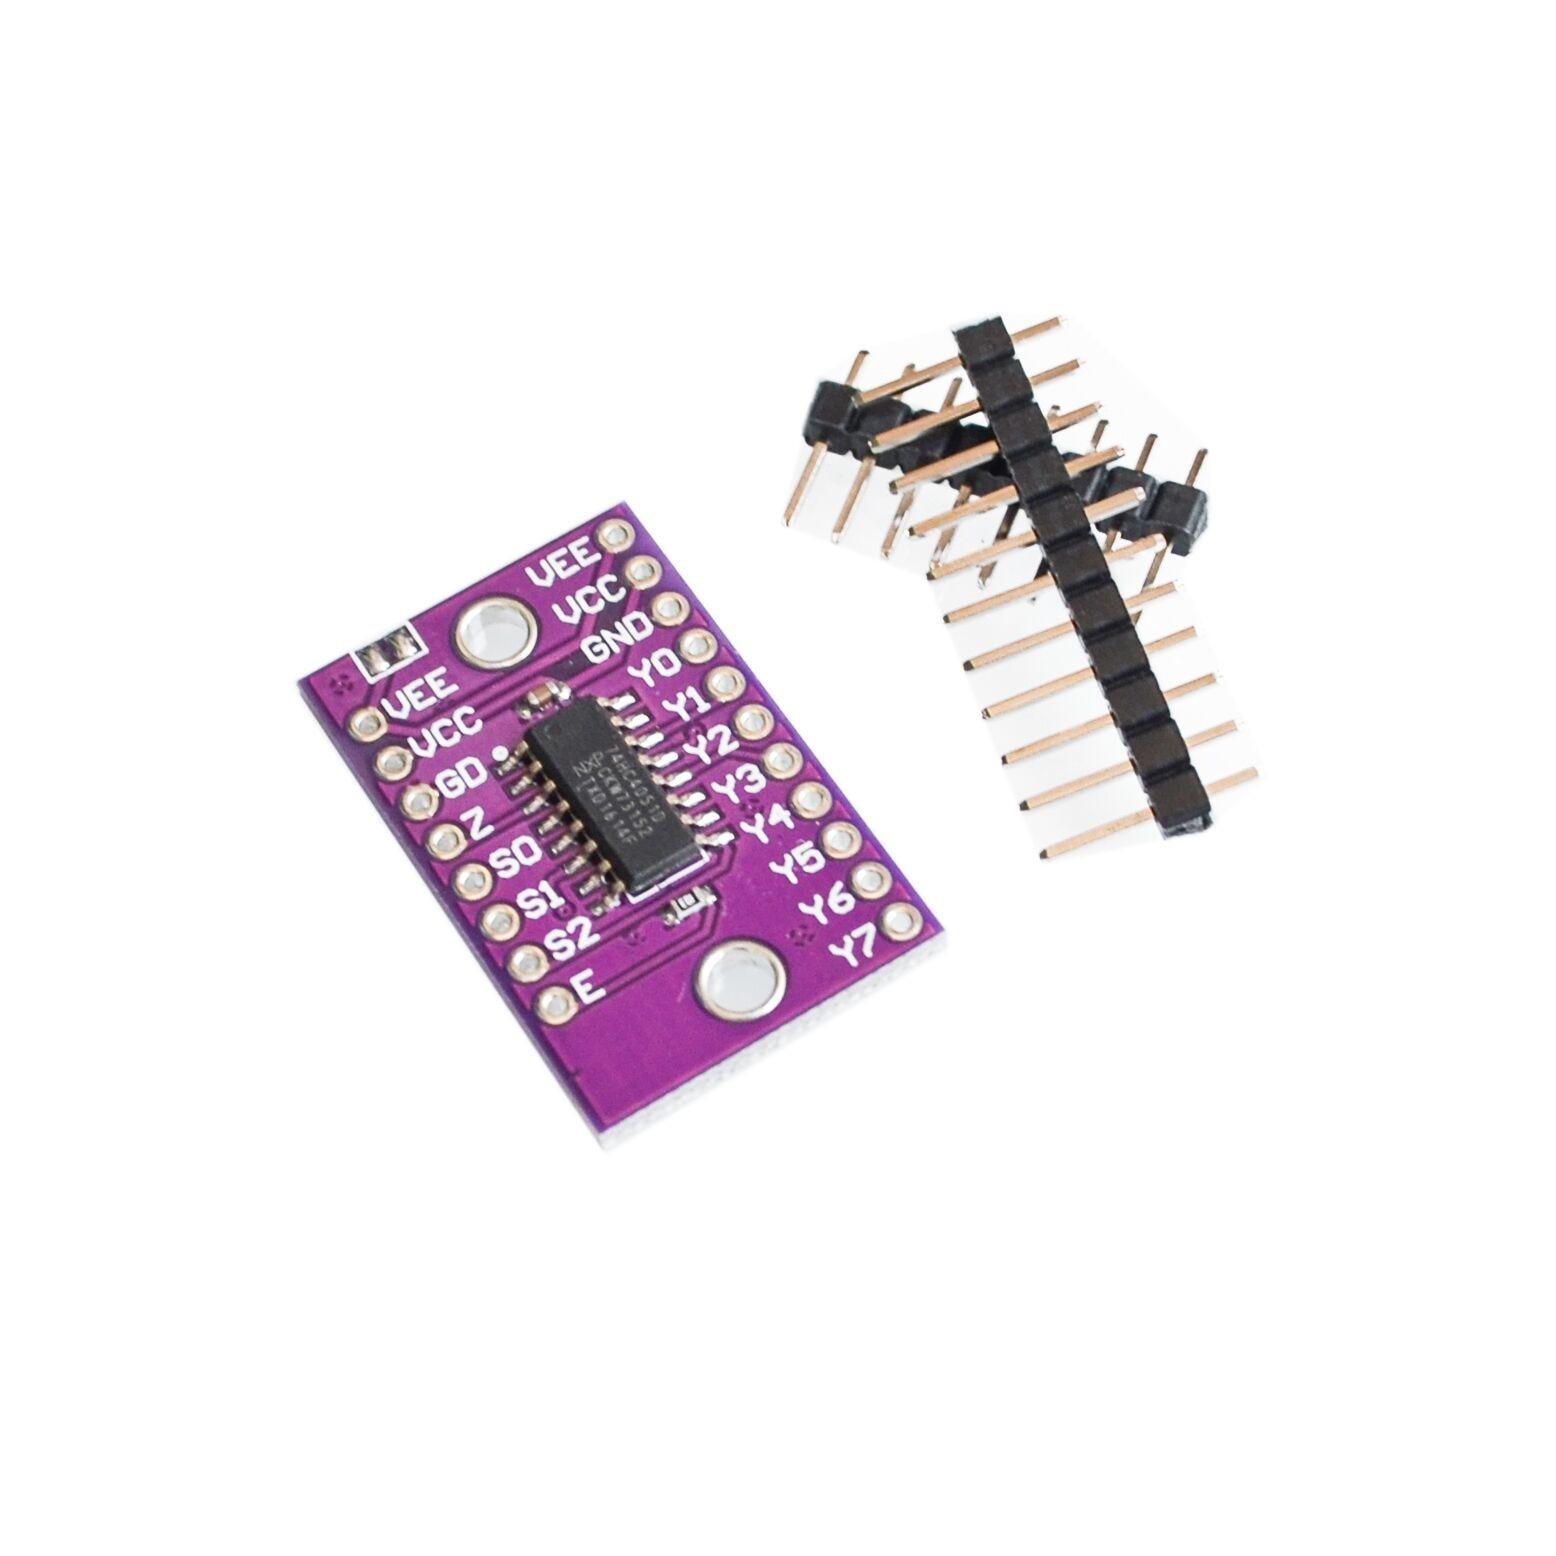 ADS1232 CJMCU 1232 24 bit ultra low noise to digital converter